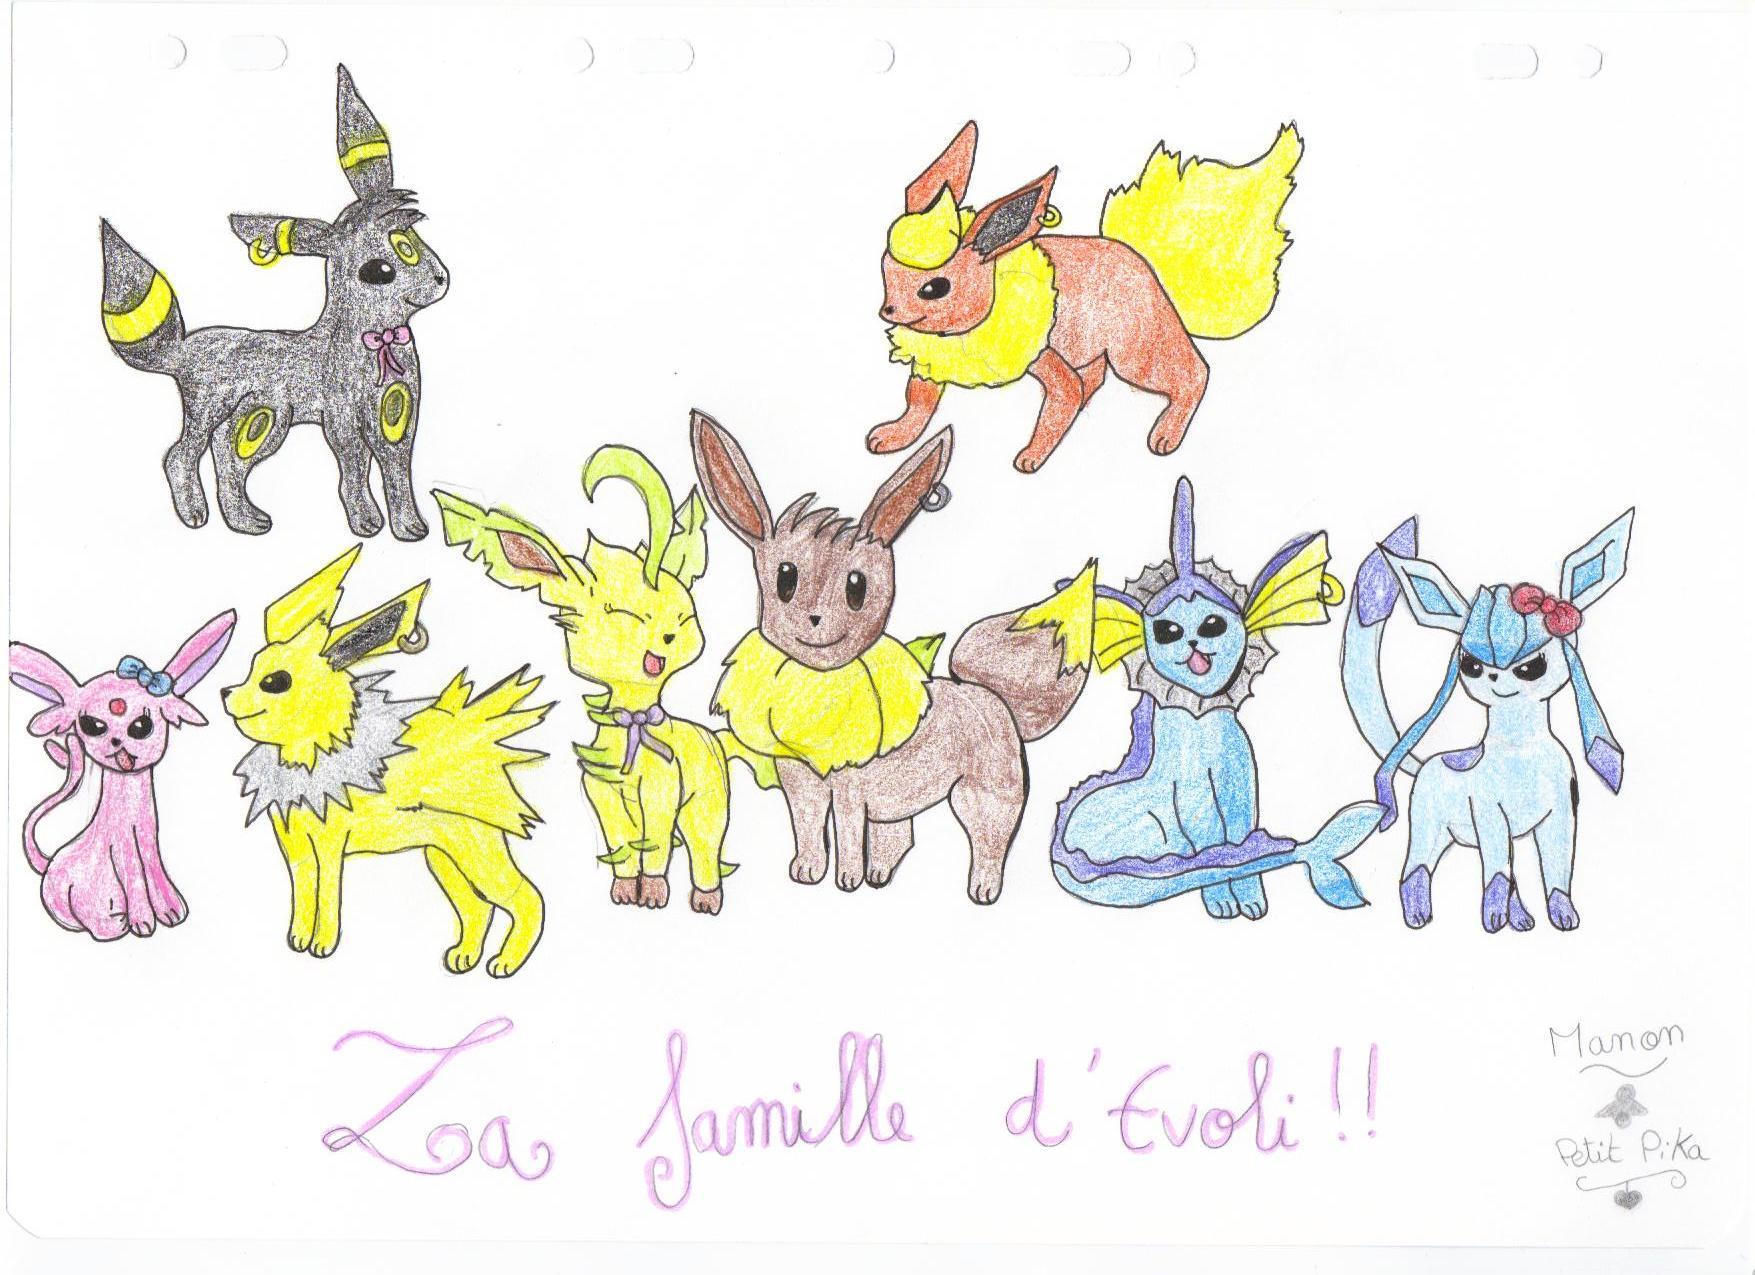 Espace membre galerie de petit pika - Famille evoli pokemon ...